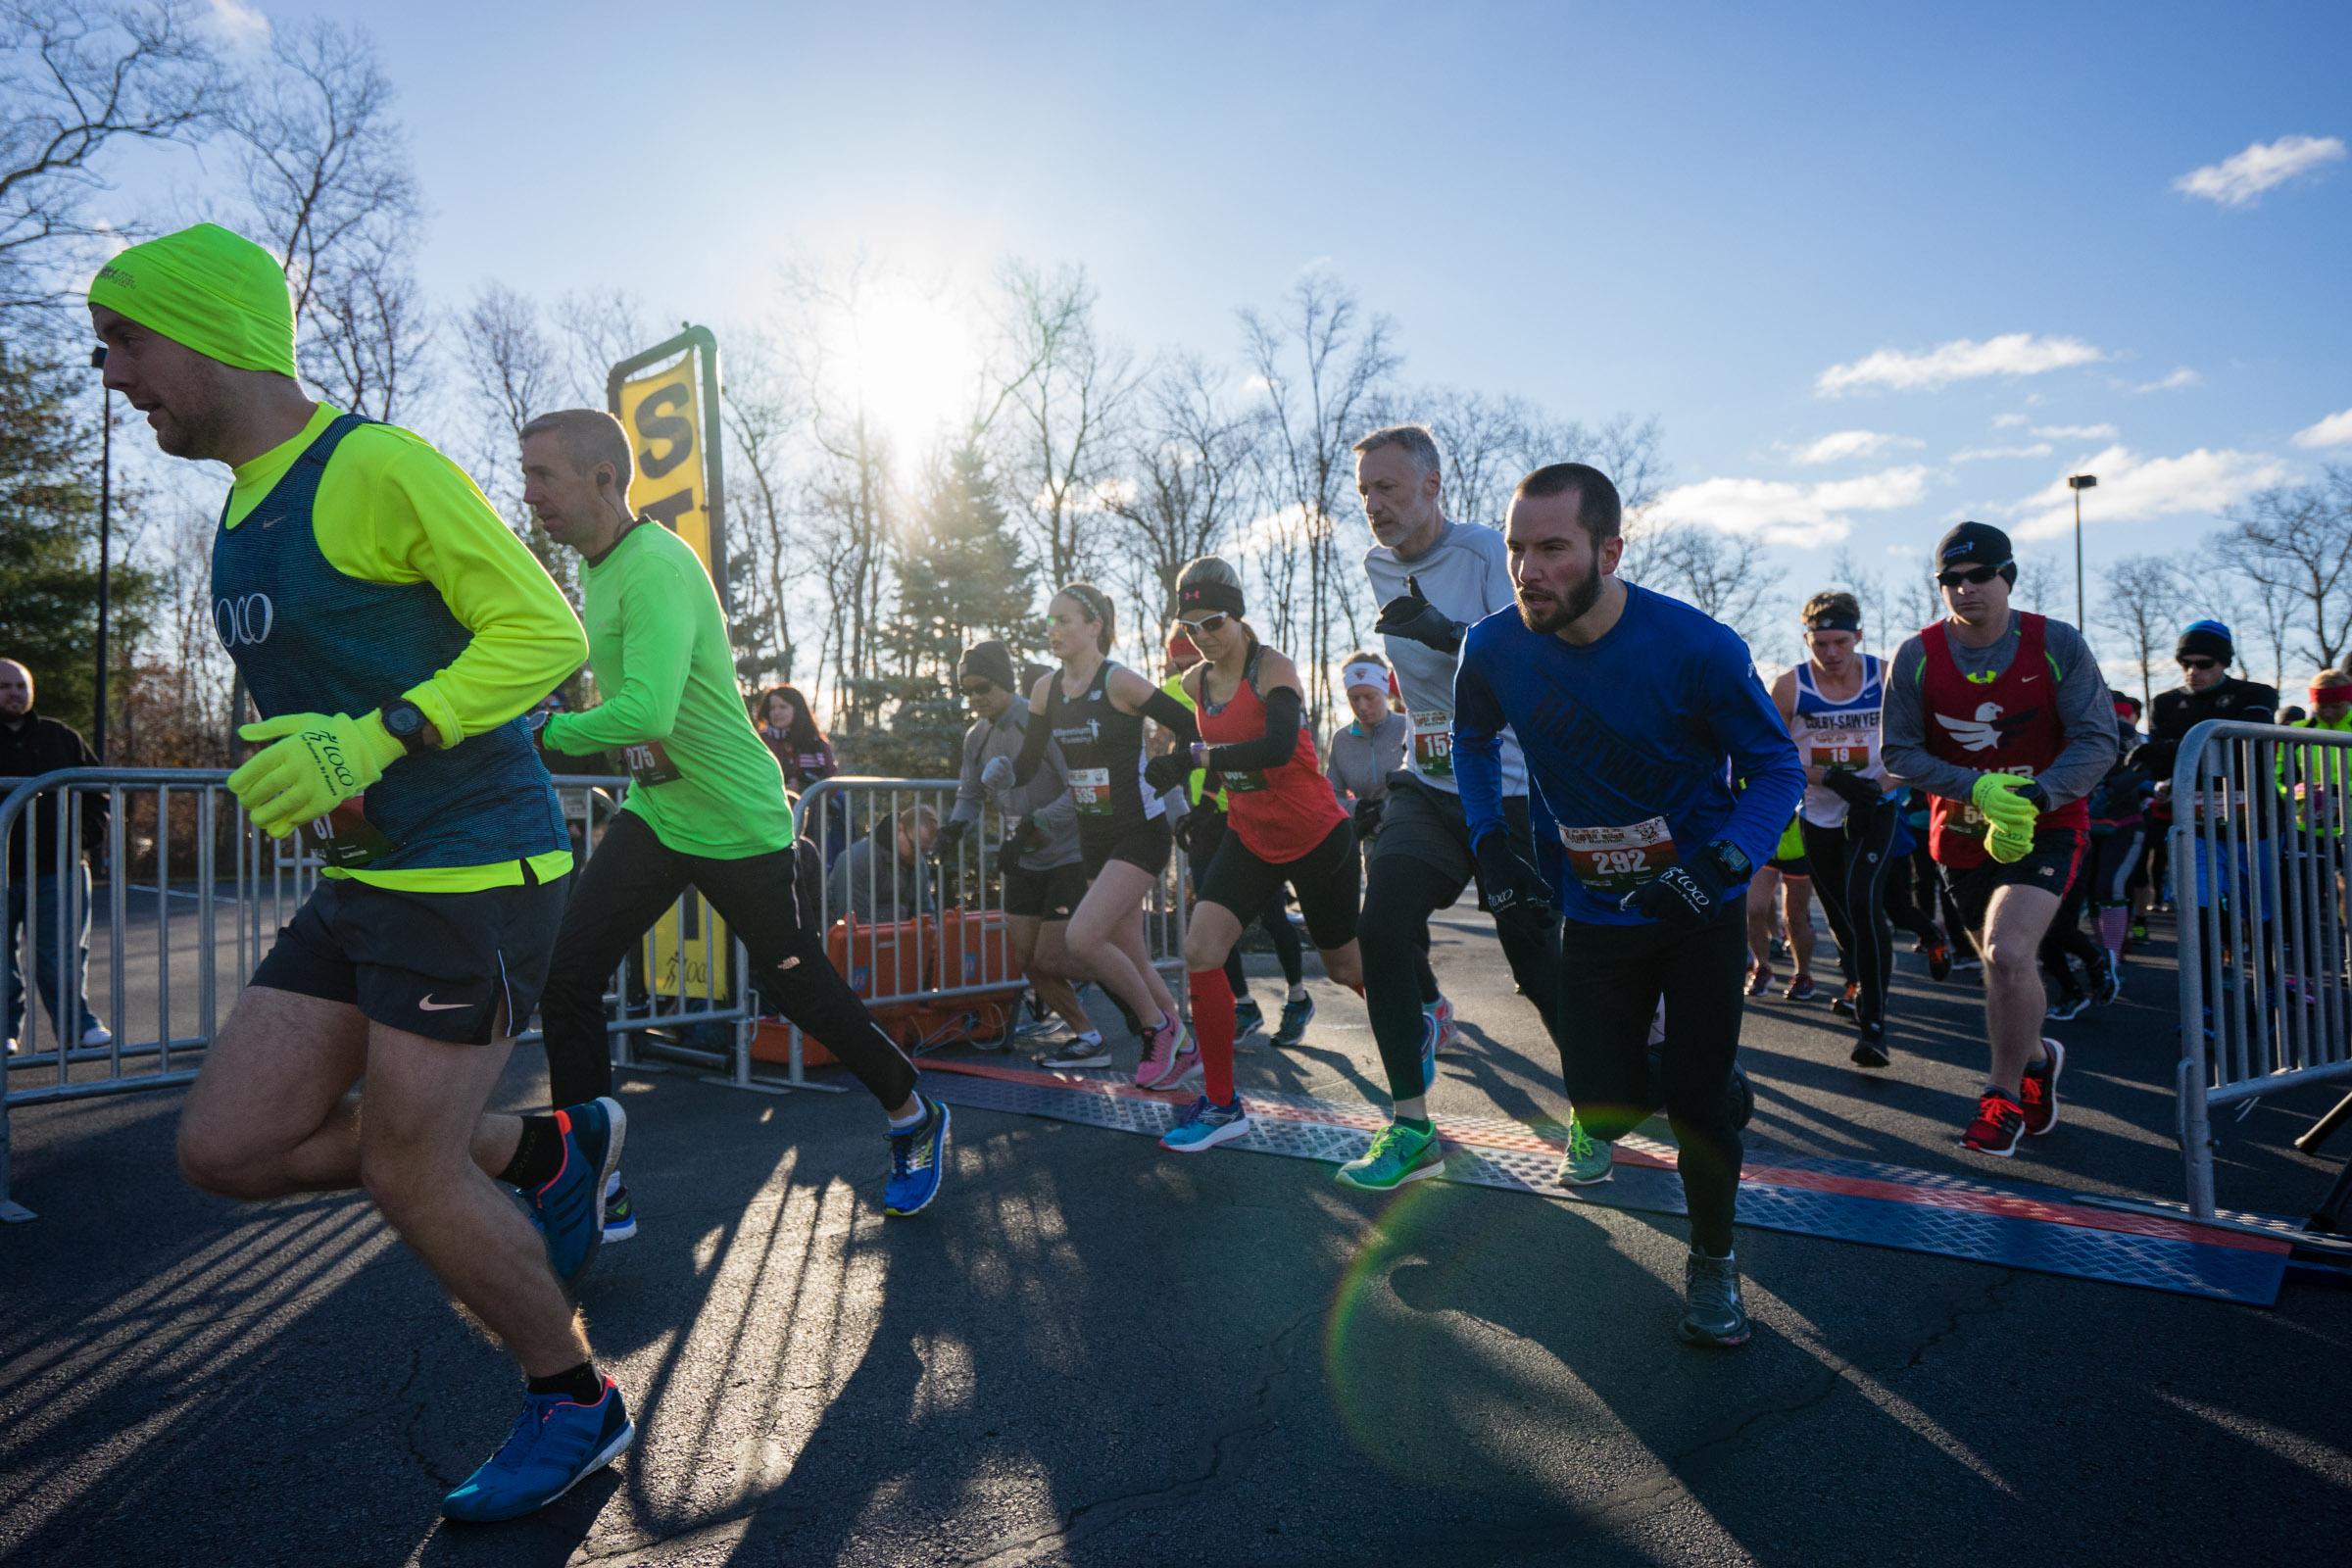 The start of the 2016 Jingle Bell Half Marathon